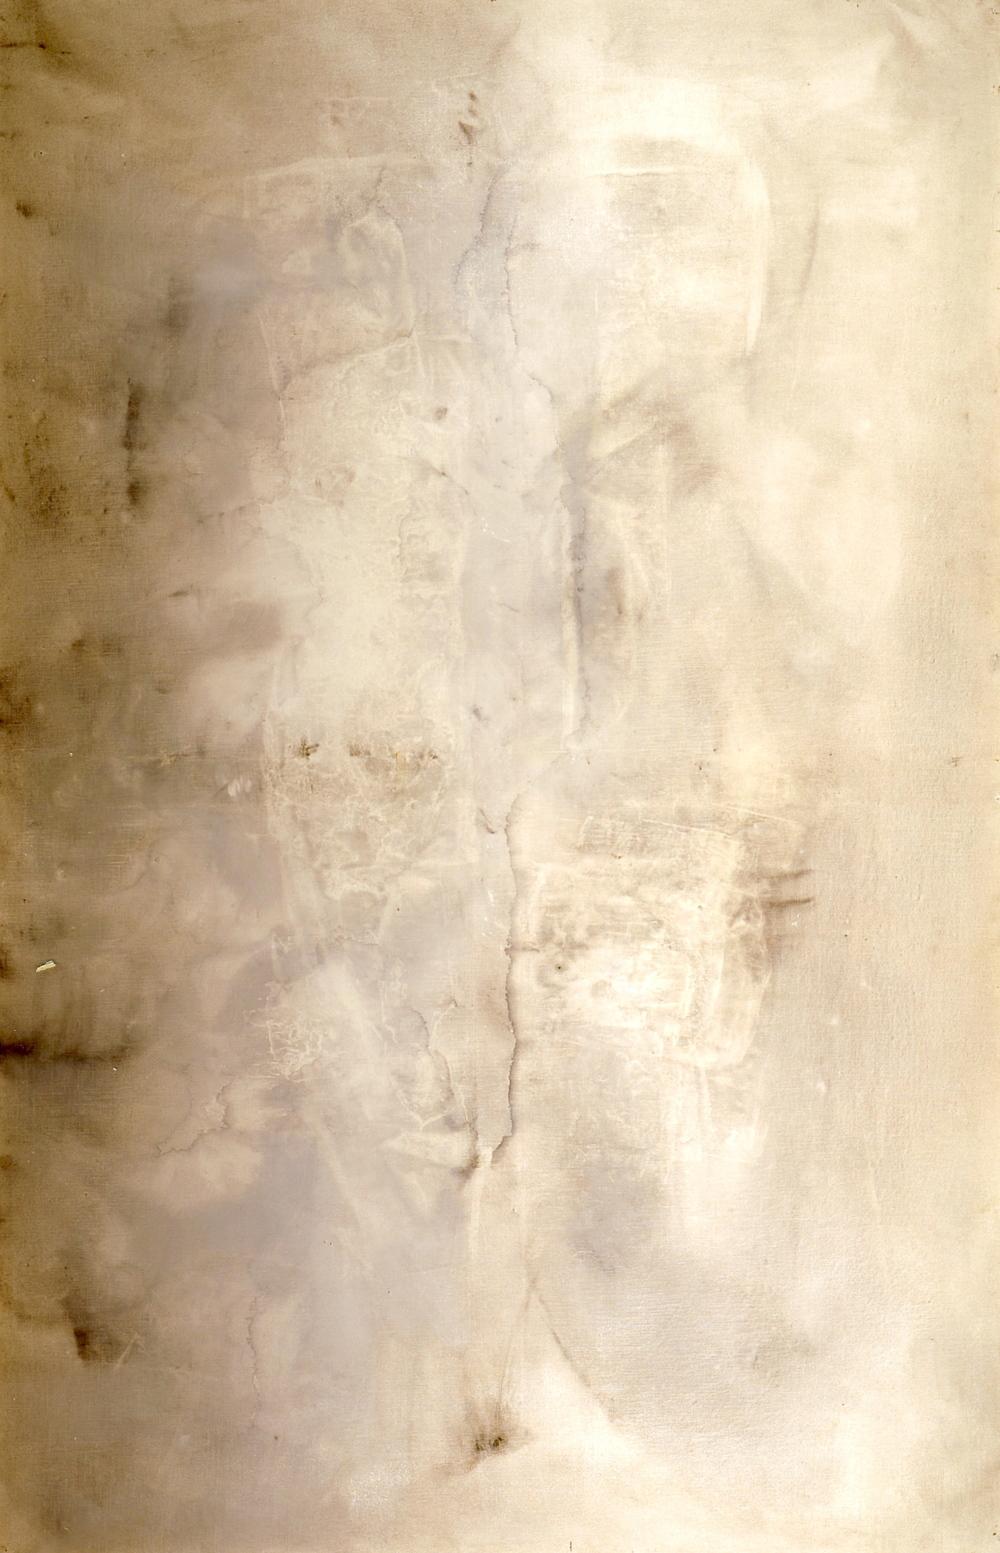 1960, Parma, collezione Francesco Fesani, olio su tela, cm 200 x 130.jpg